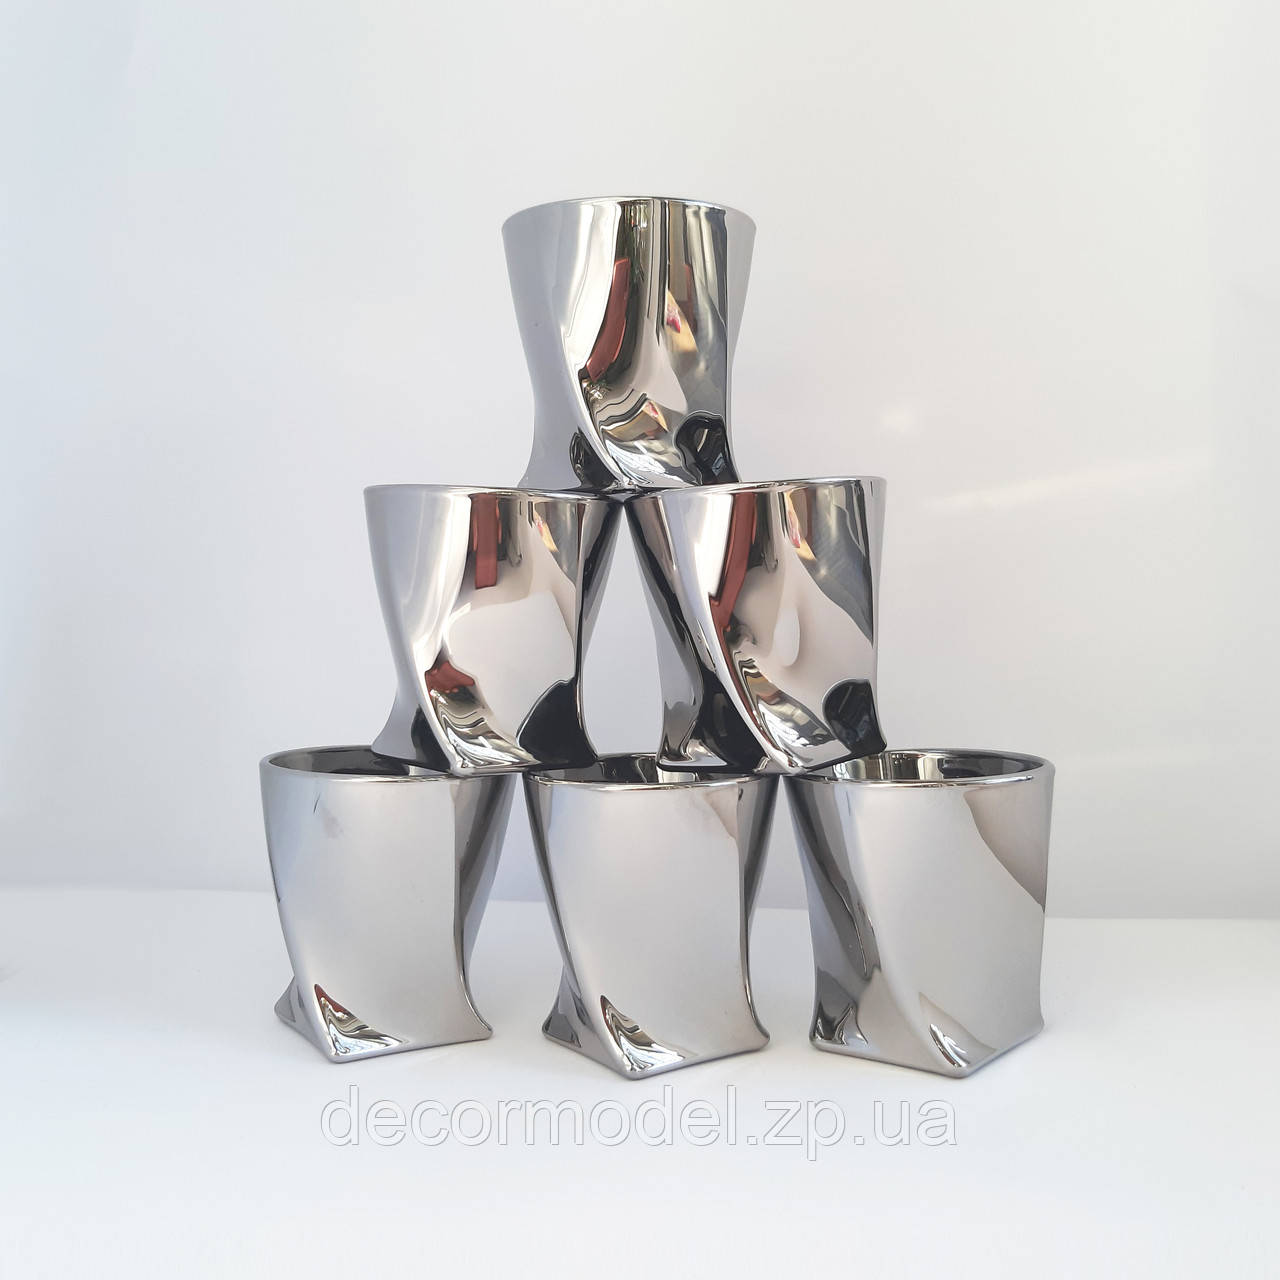 Набор стопок Bohemia Quadro Platinum 55 мл 2K936/00001/055 серебристый